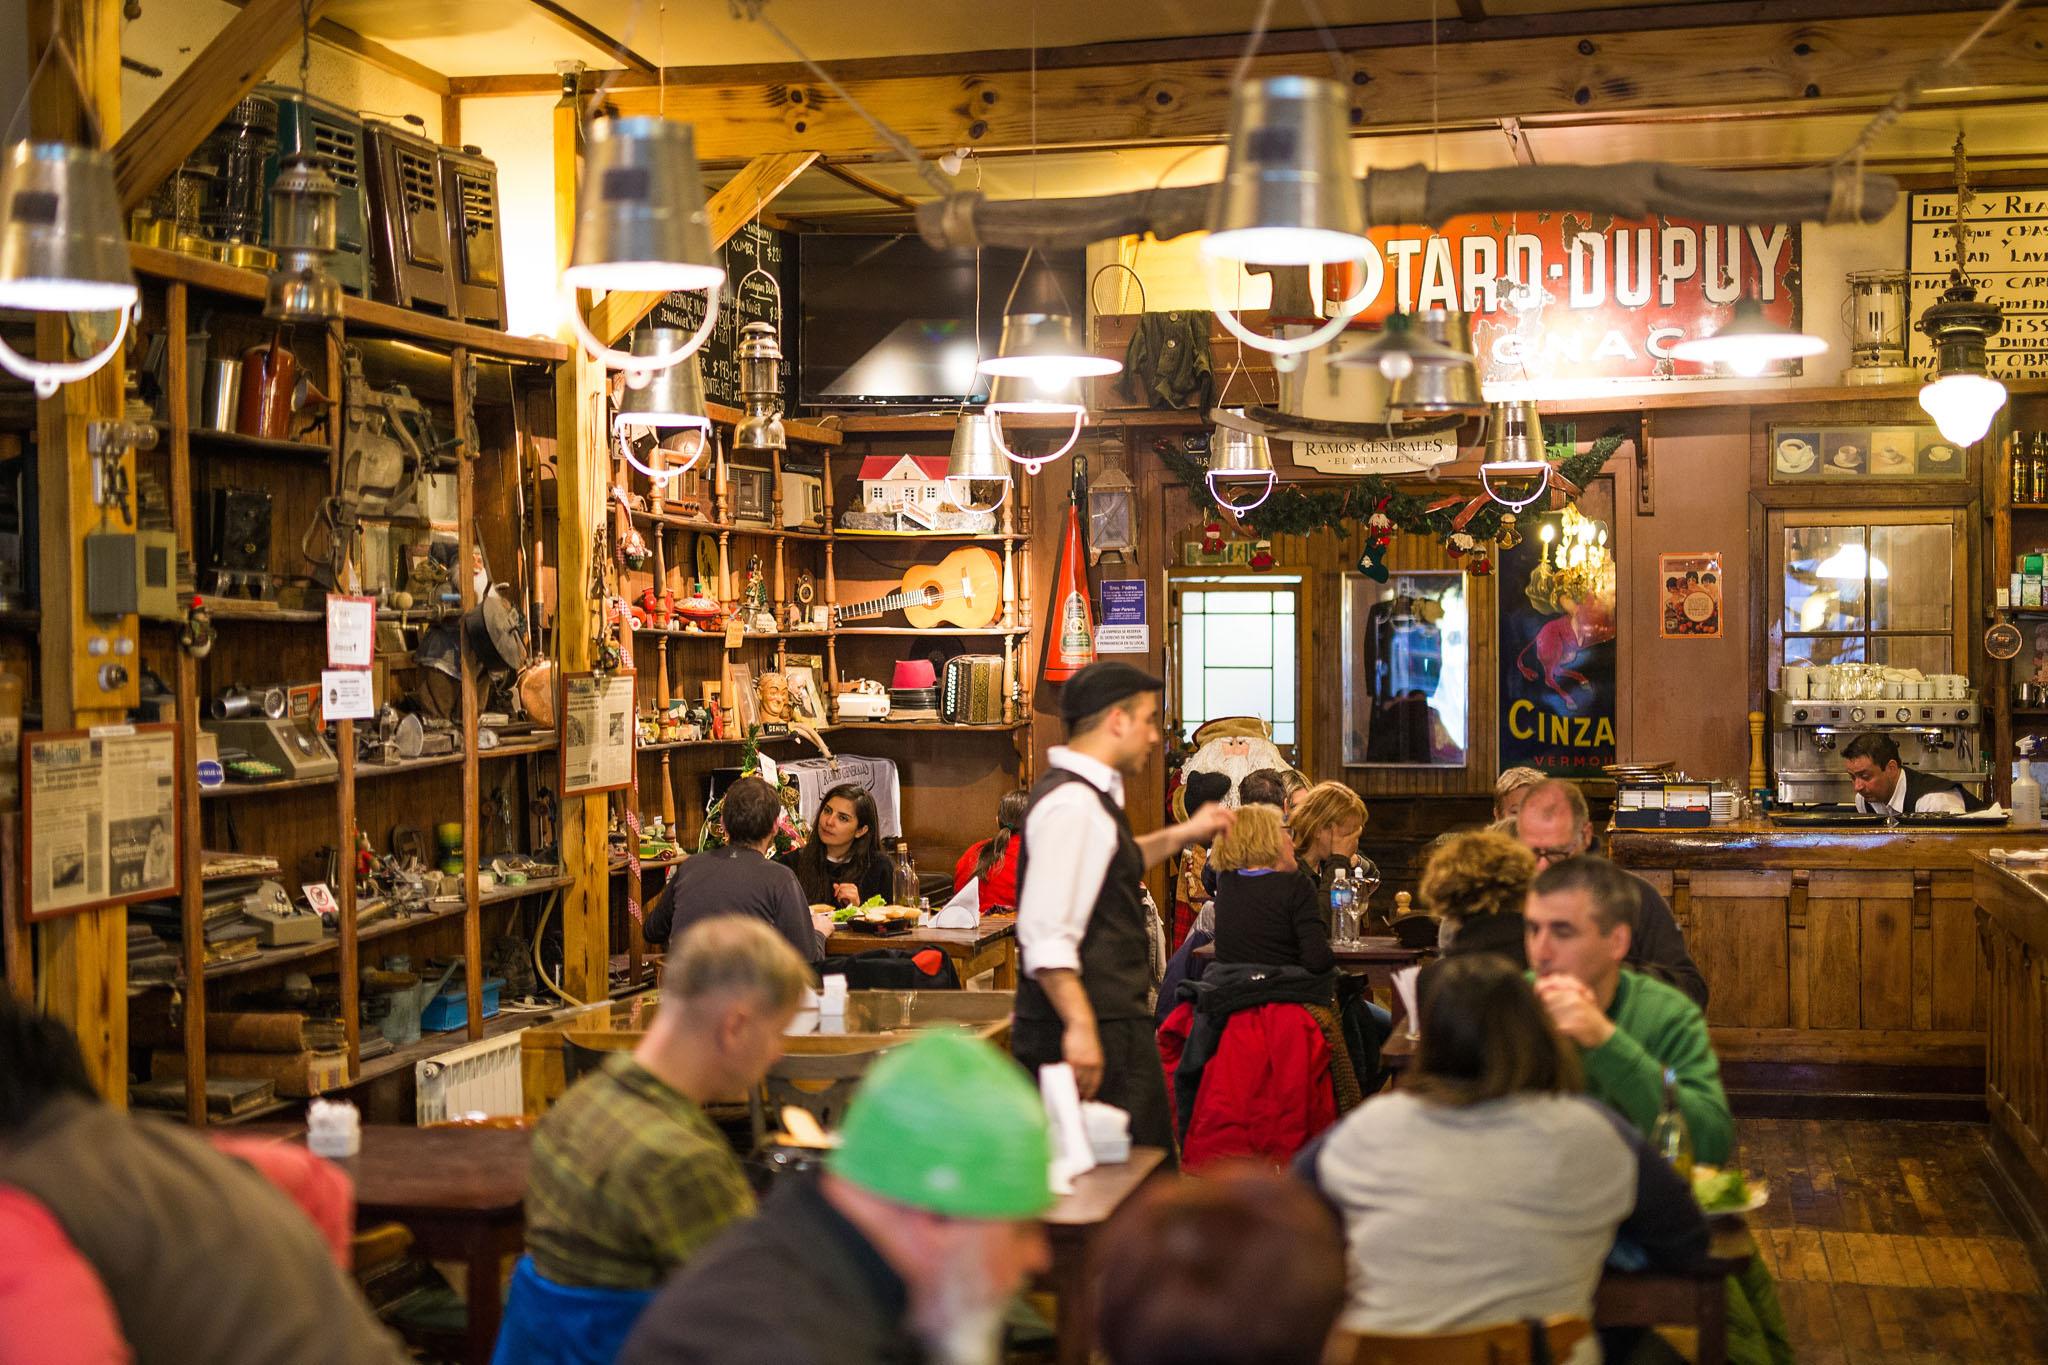 wedding-travellers-tierra-del-fuego-ushuaia-argetina-interesting-famous-old-bar